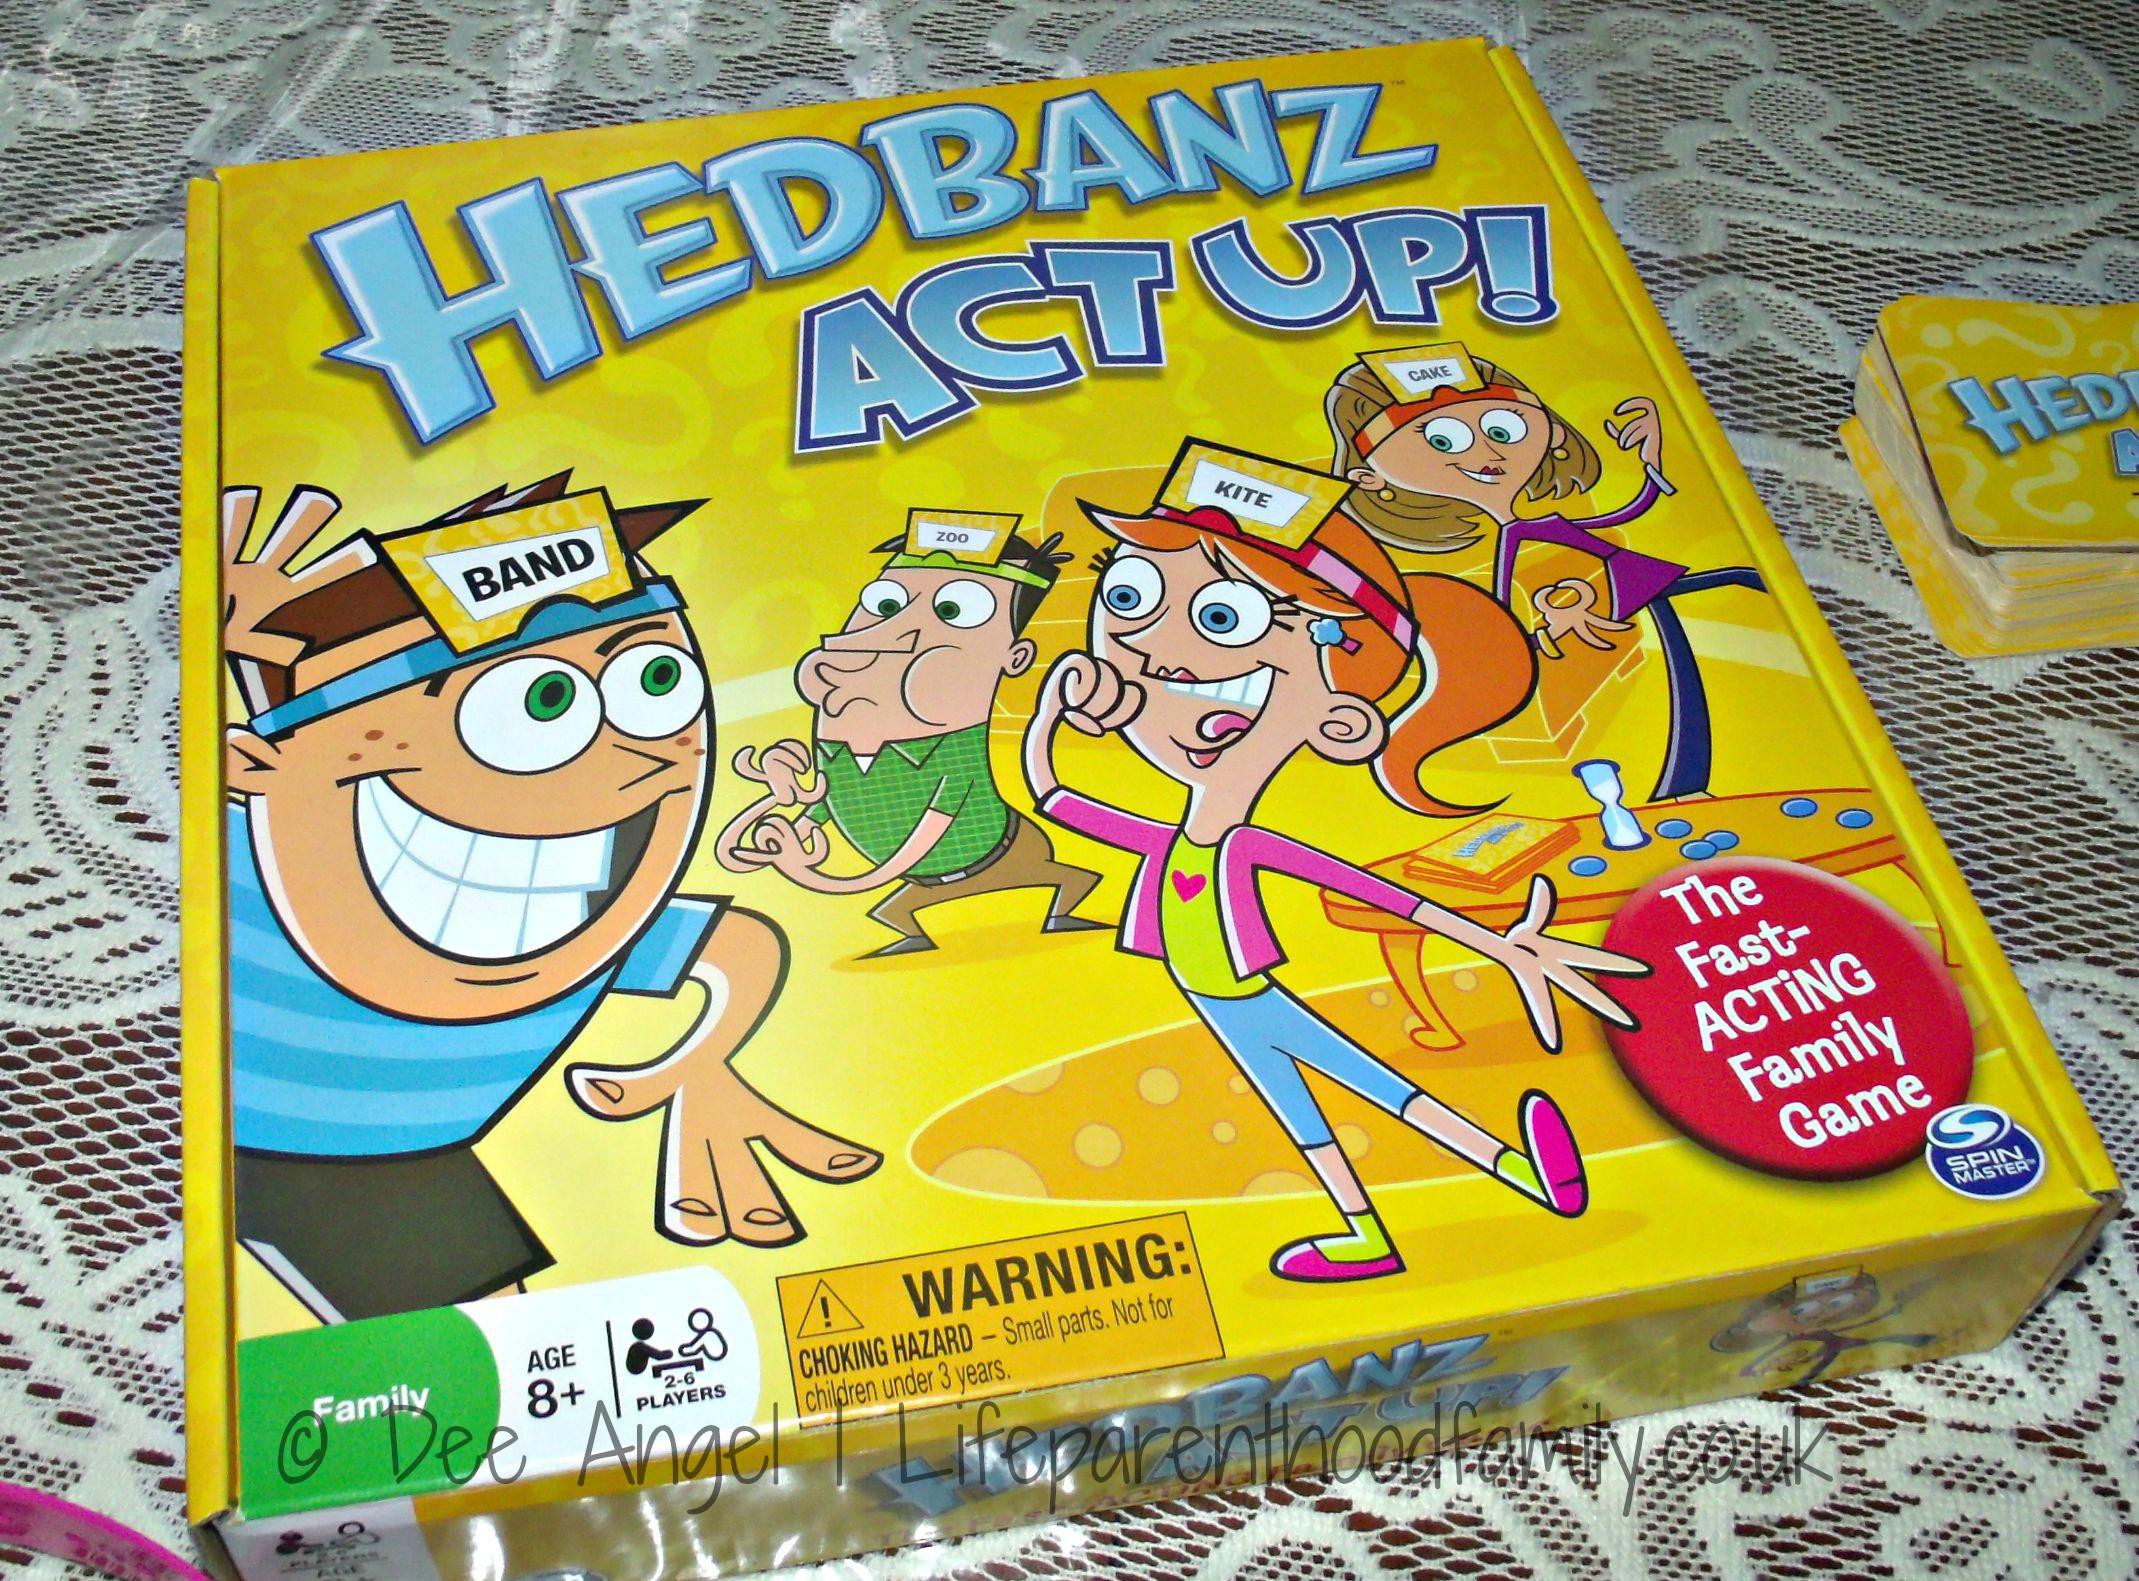 Hedbanz Act Up Game  Lifeparenthoodfamily.co.uk